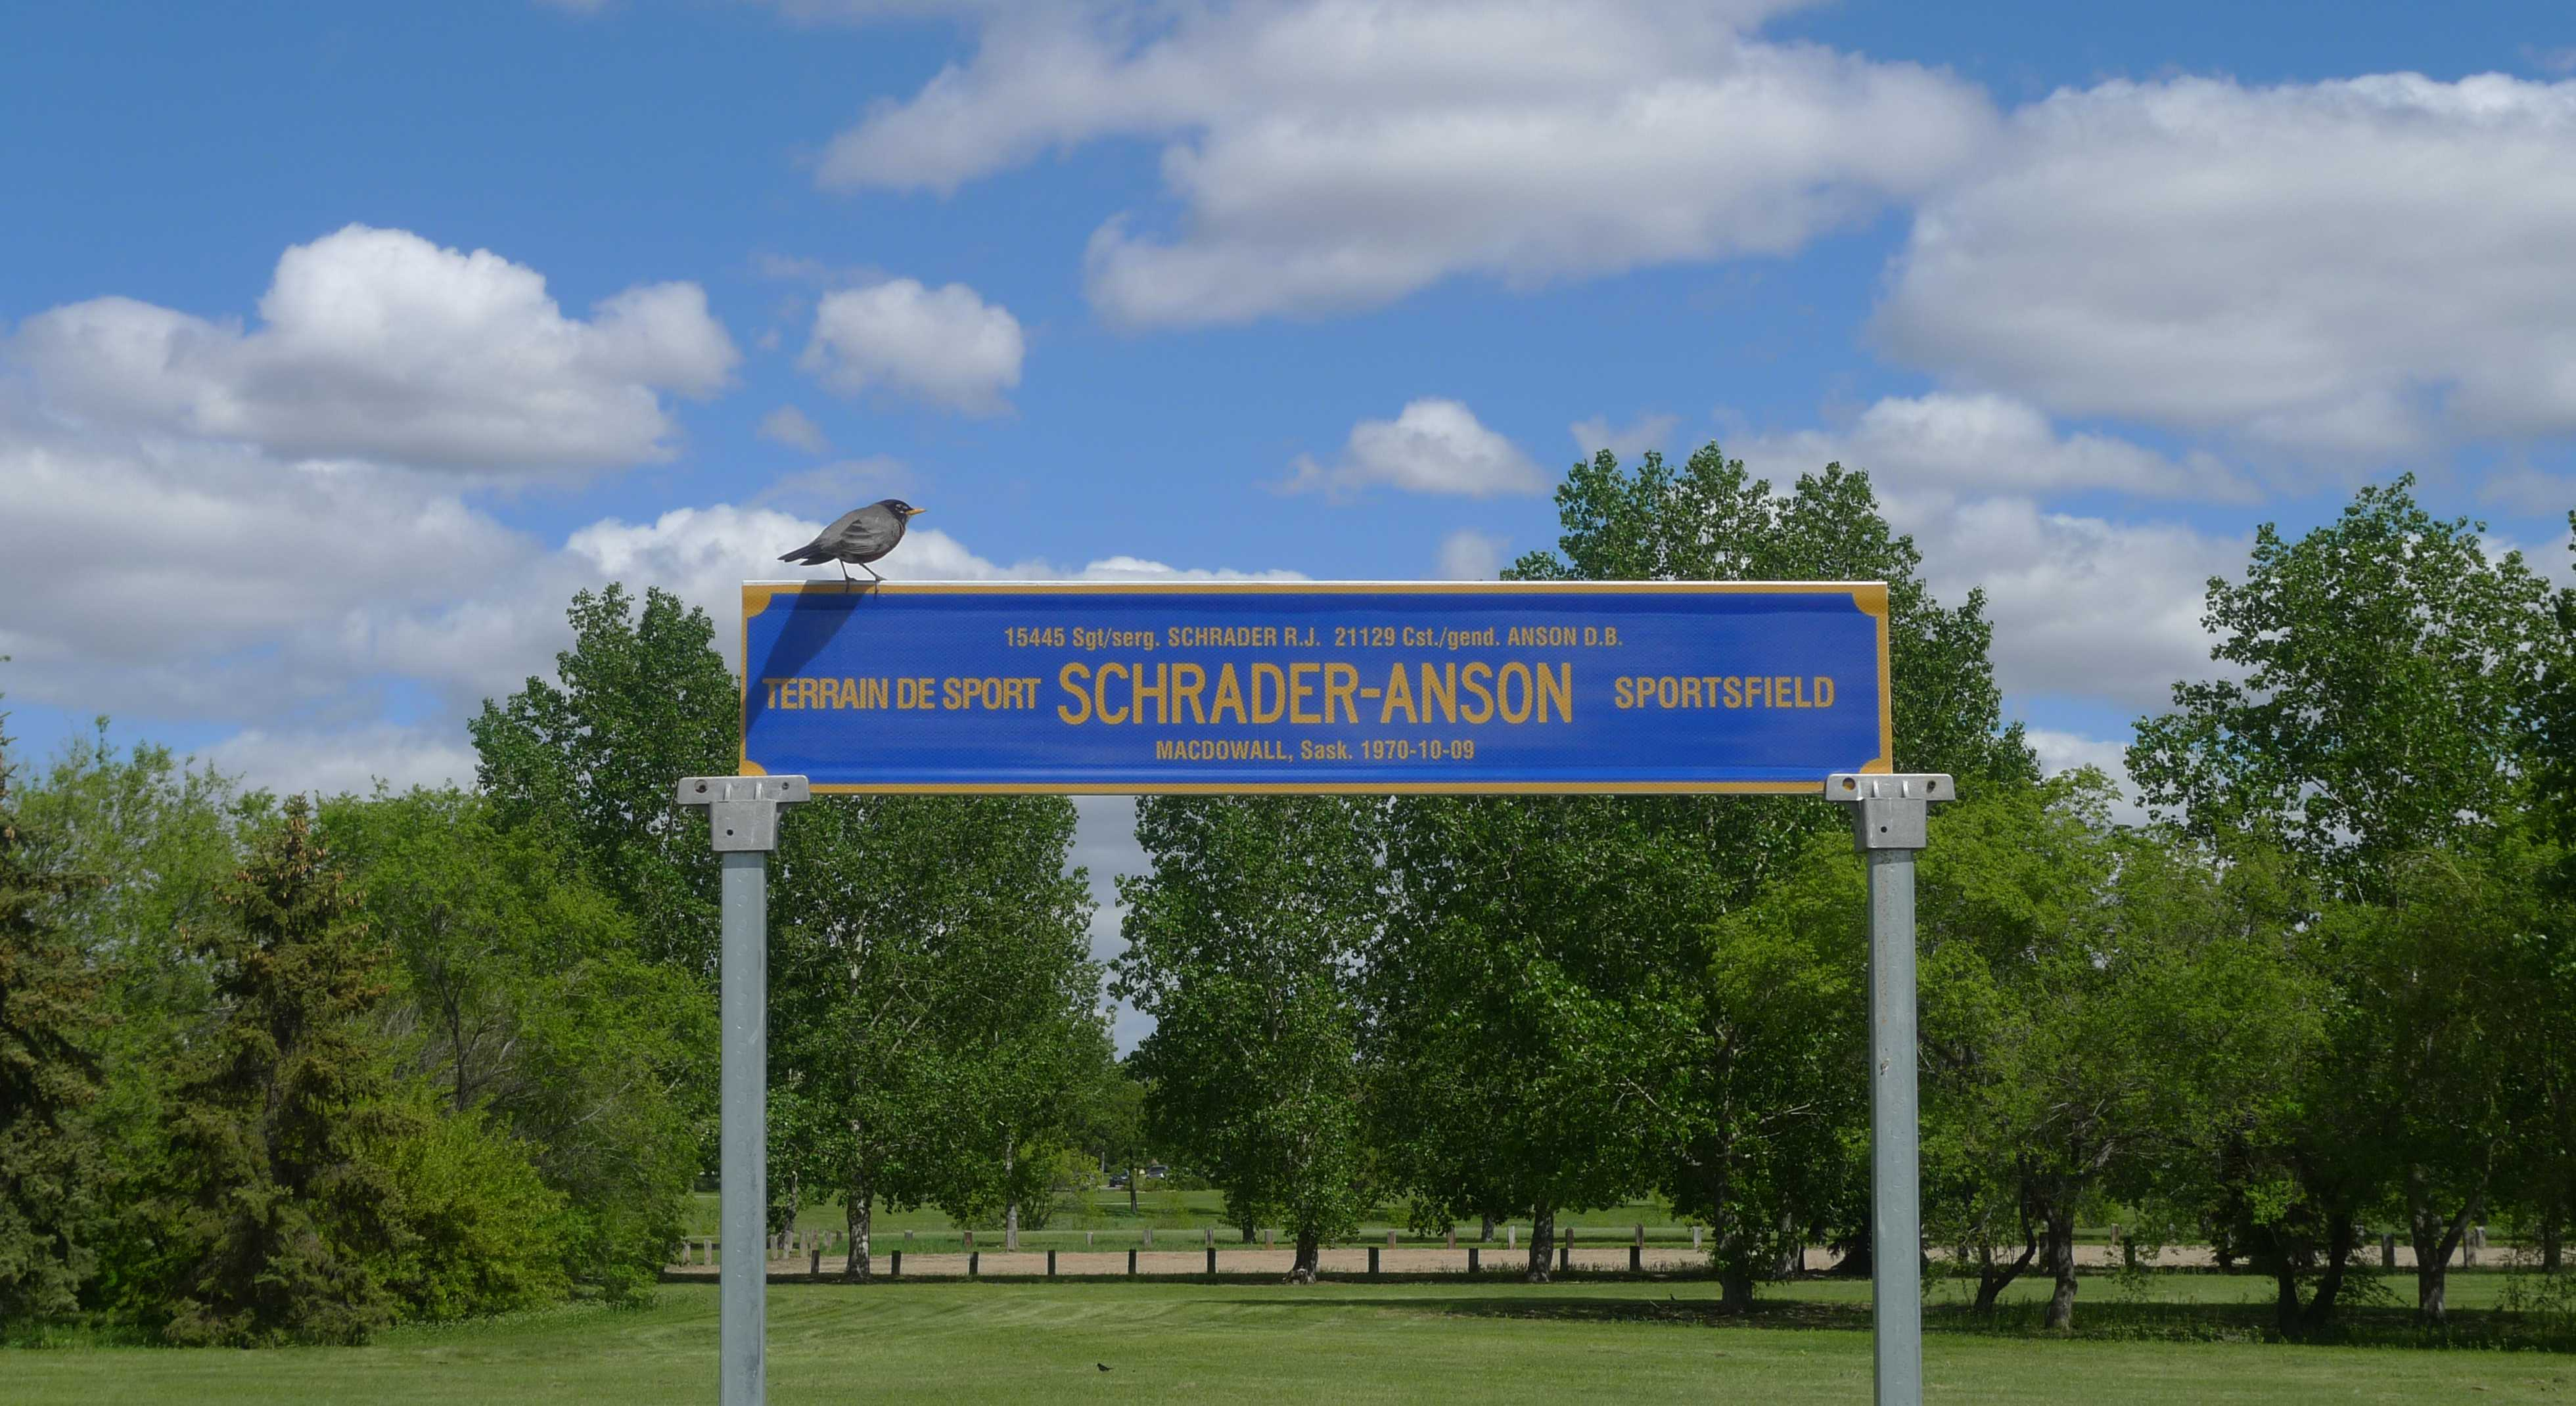 Schrader-Anson Sports Field at Depot